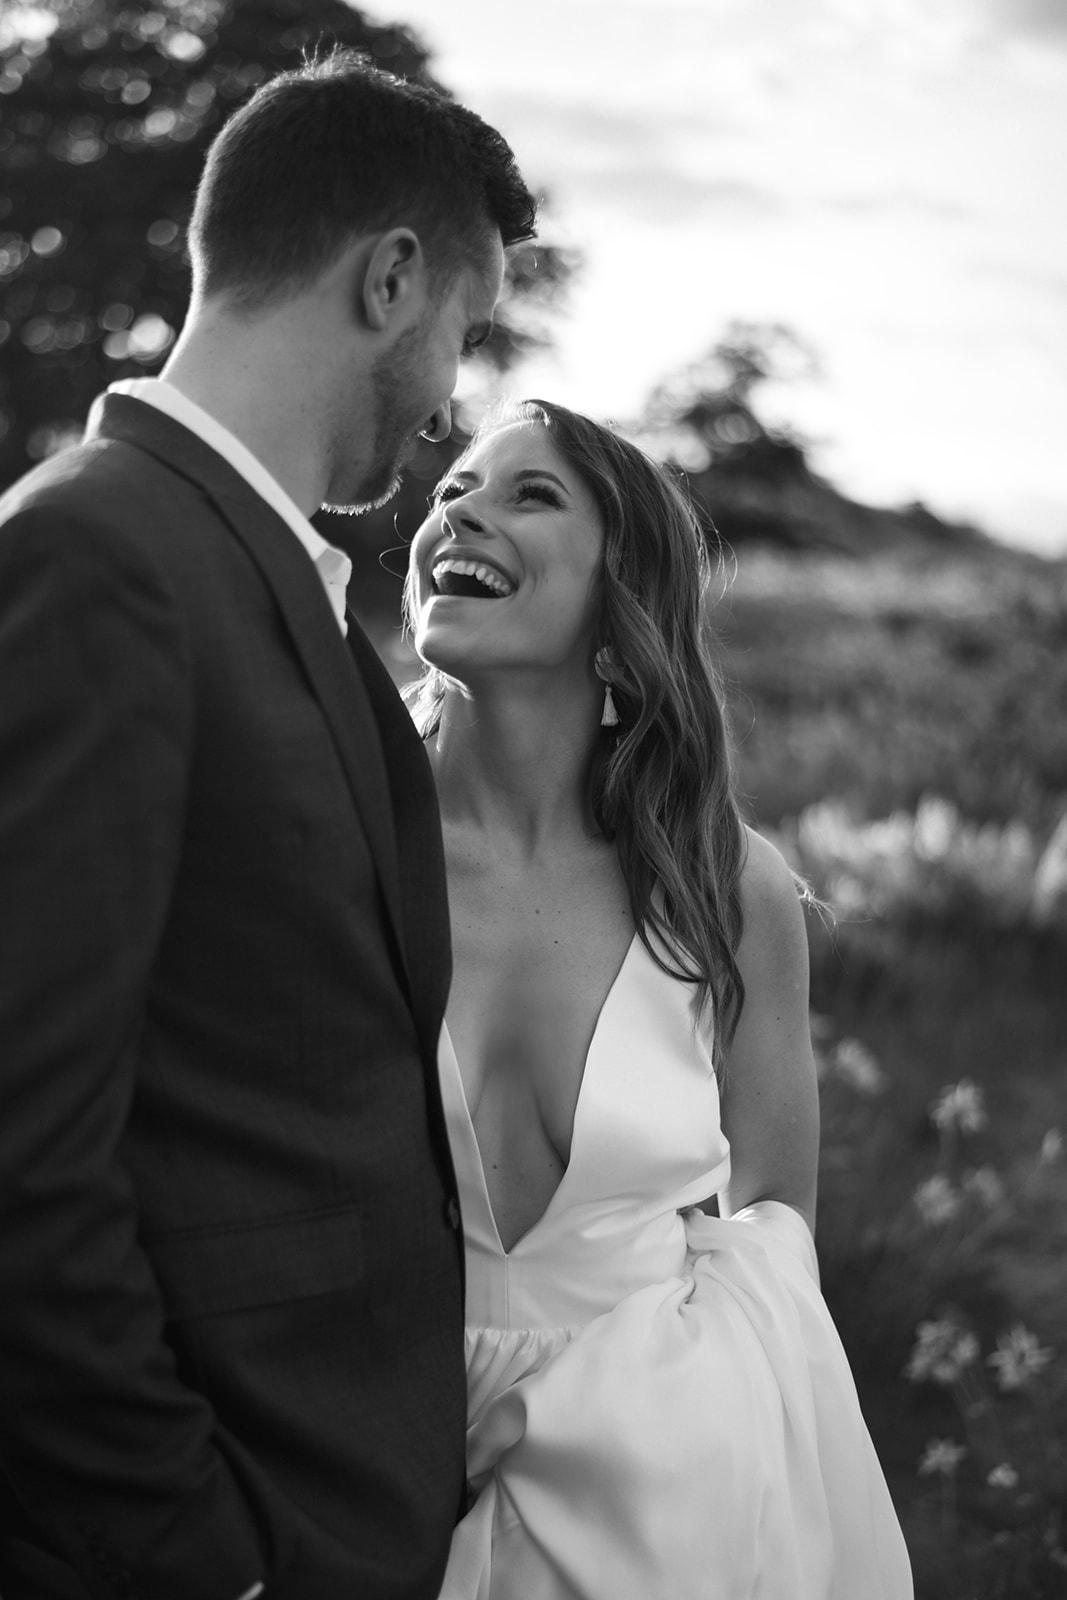 kamea_events_wedding_planner_portland_deus_amor_9927.jpg